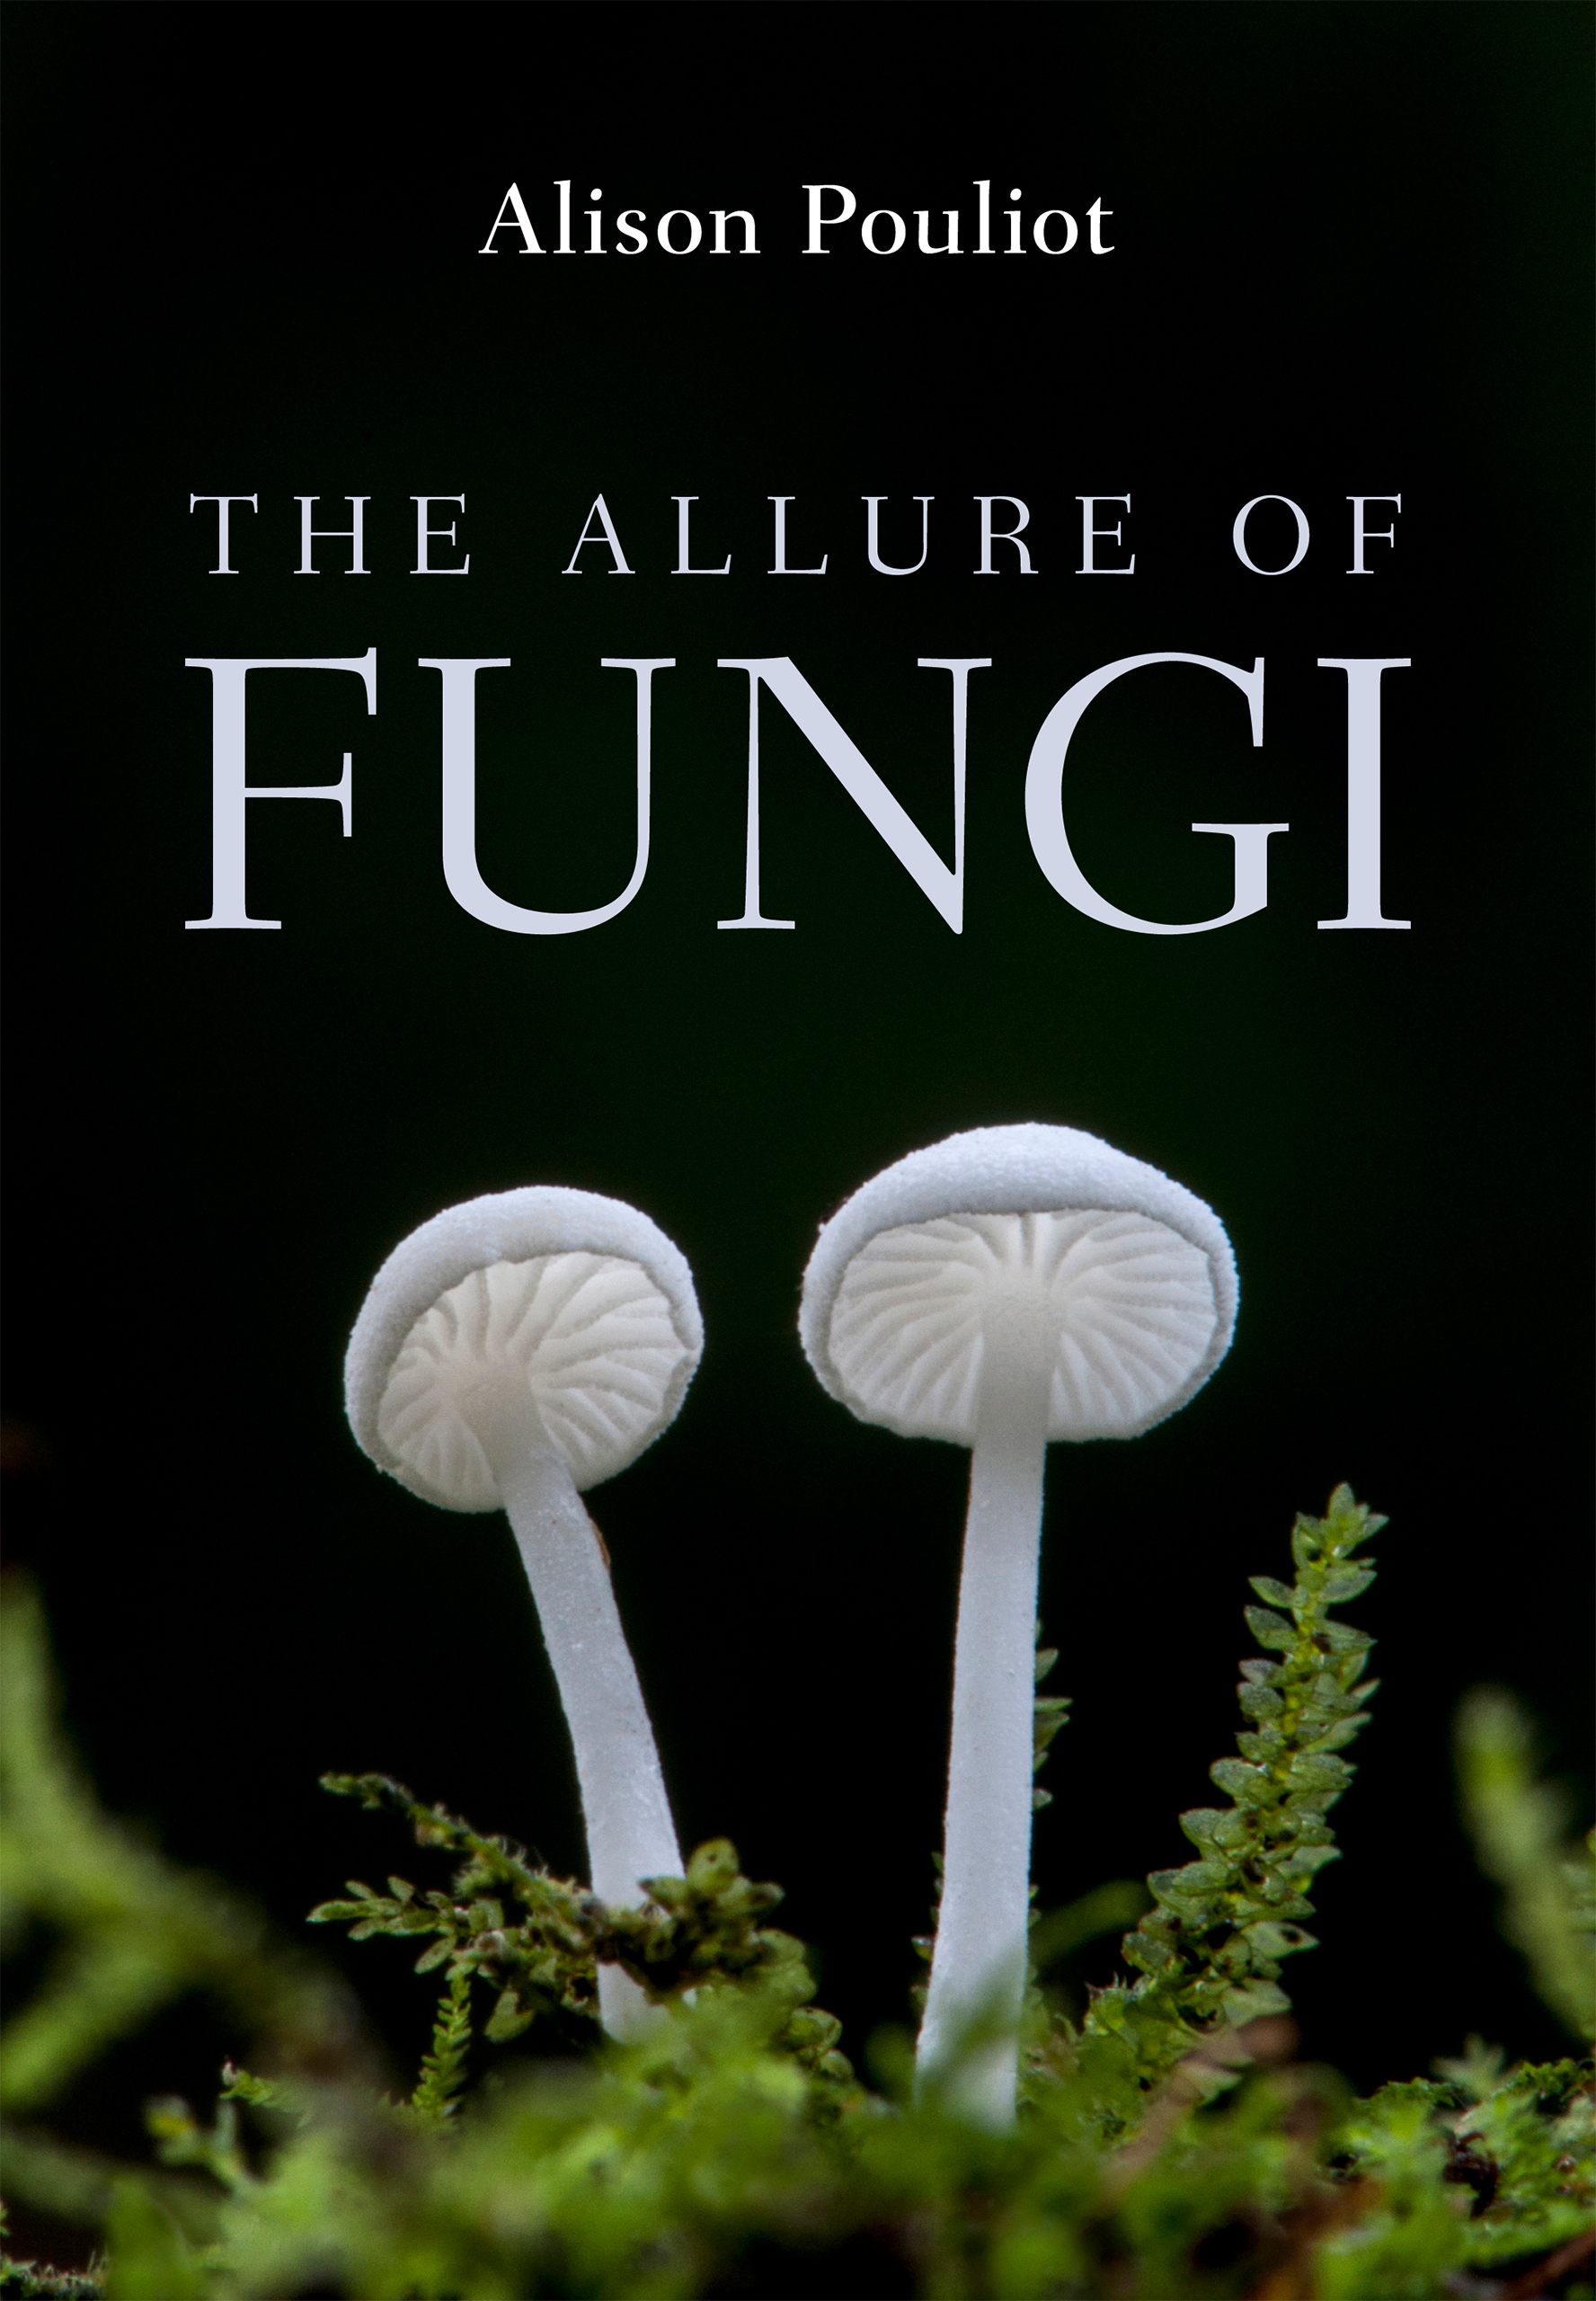 The Allure of Fungi